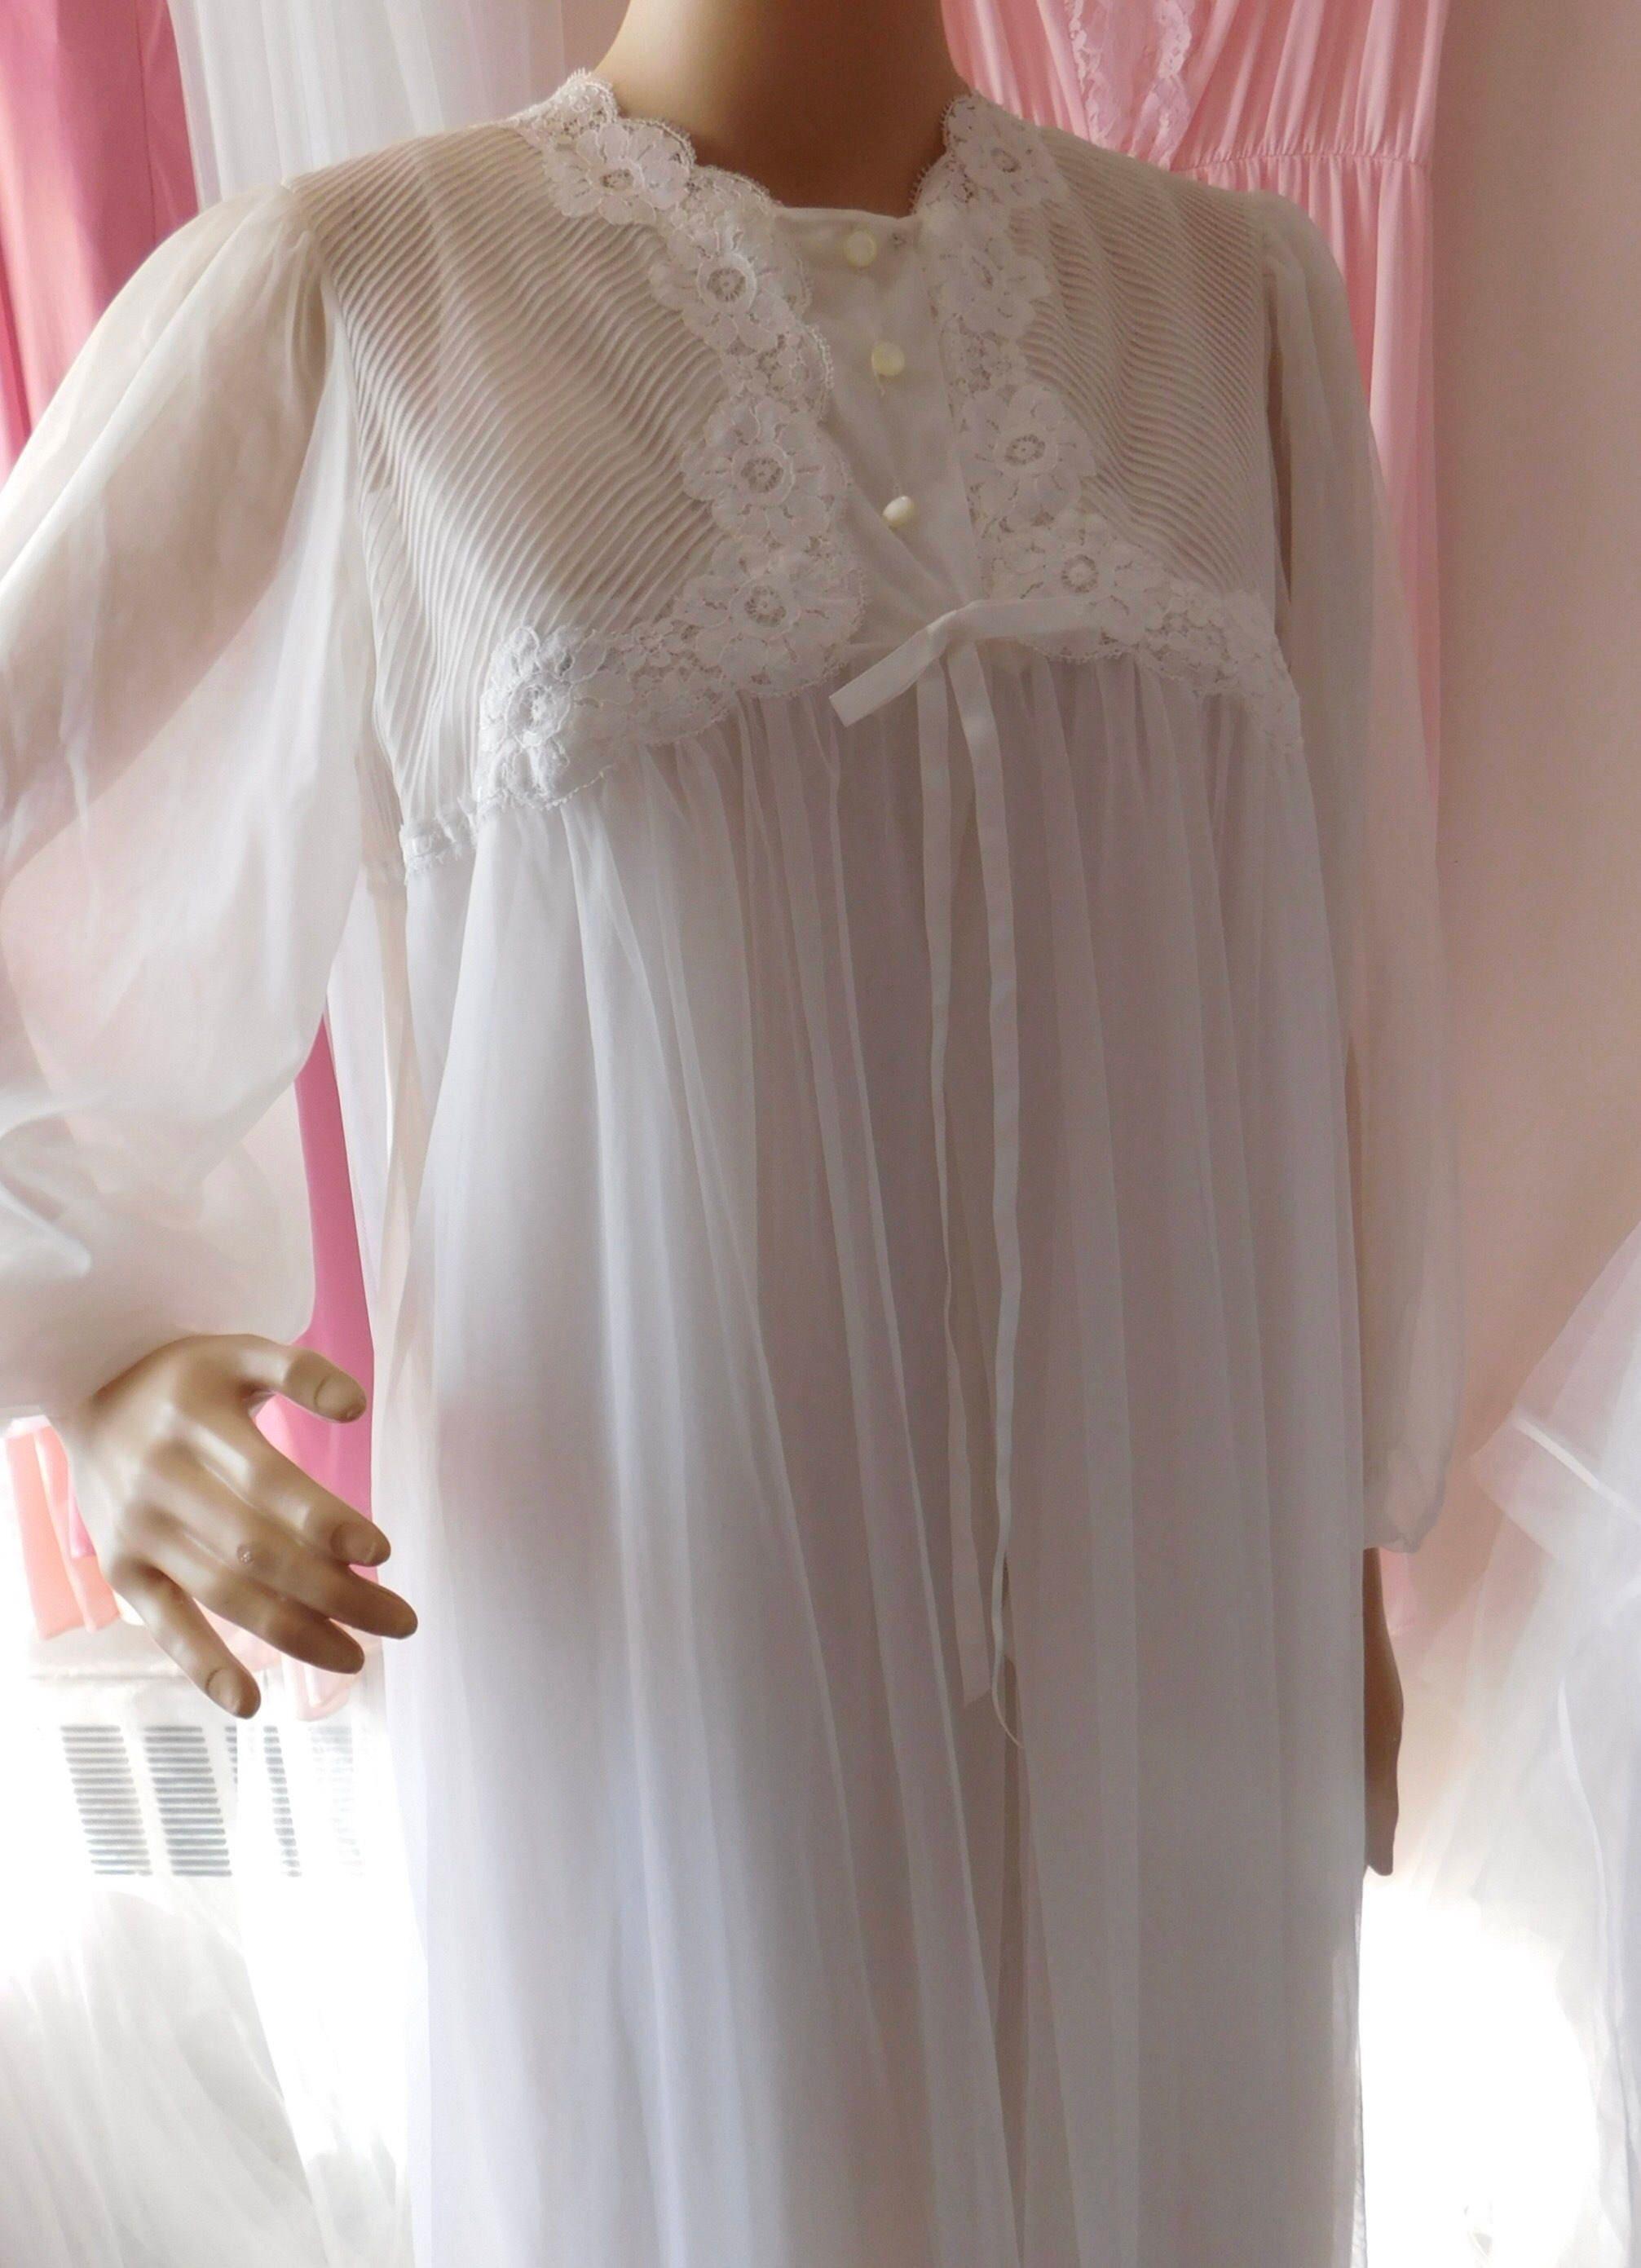 Vintage Lingerie Bridal Peignoir Set Gossard Artemis Medium M Sheer Frothy Multi Layer White Chiffon /& Nylon Long Gown and Robe